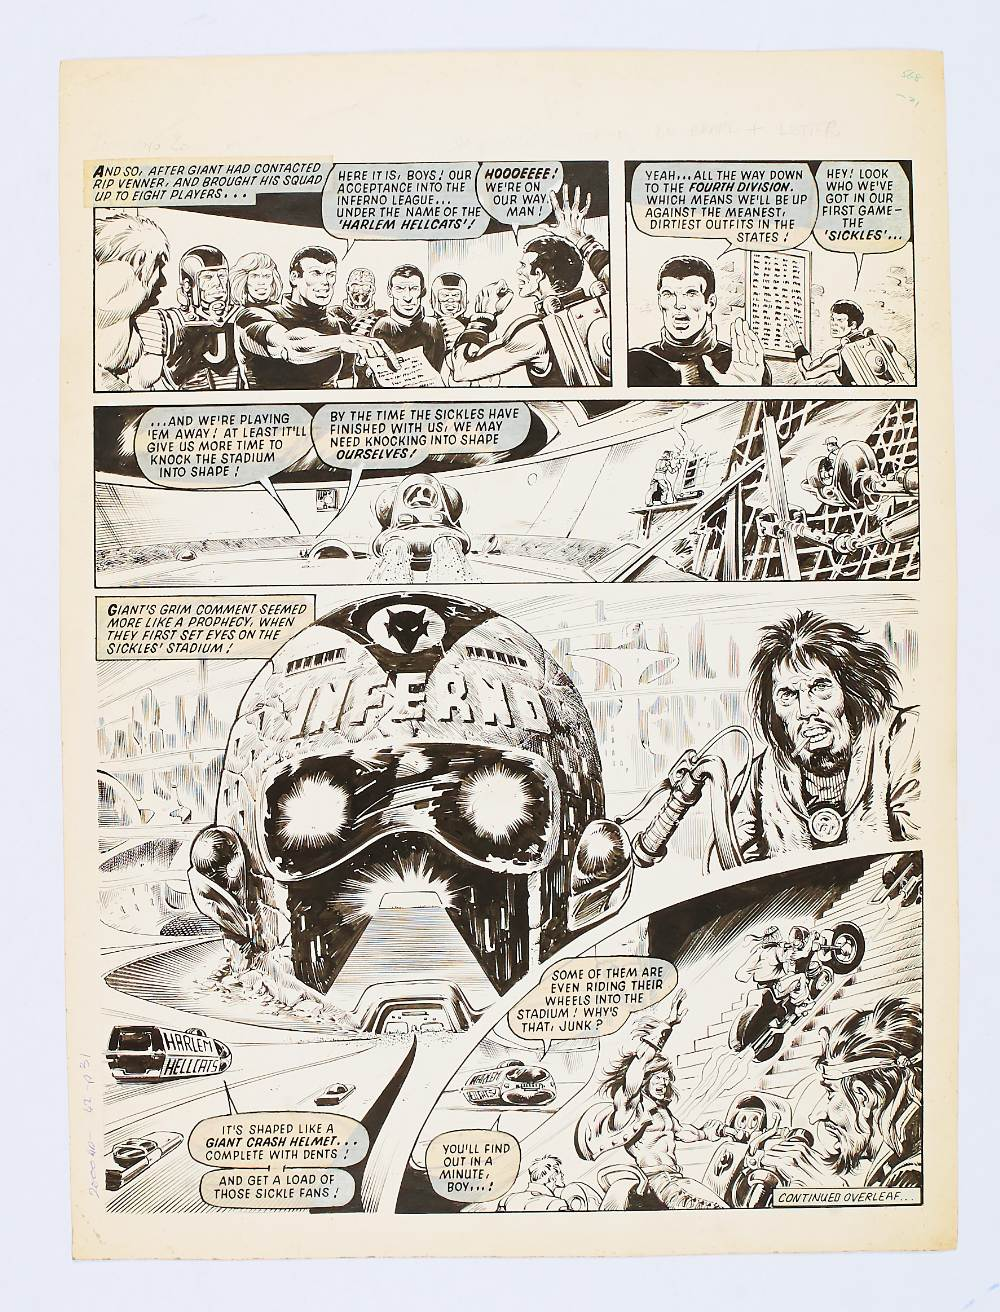 Lot 109 - 2000 AD / Inferno original artwork by Massimo Benardinelli from Prog 45 page 31 Dec 10 1977.